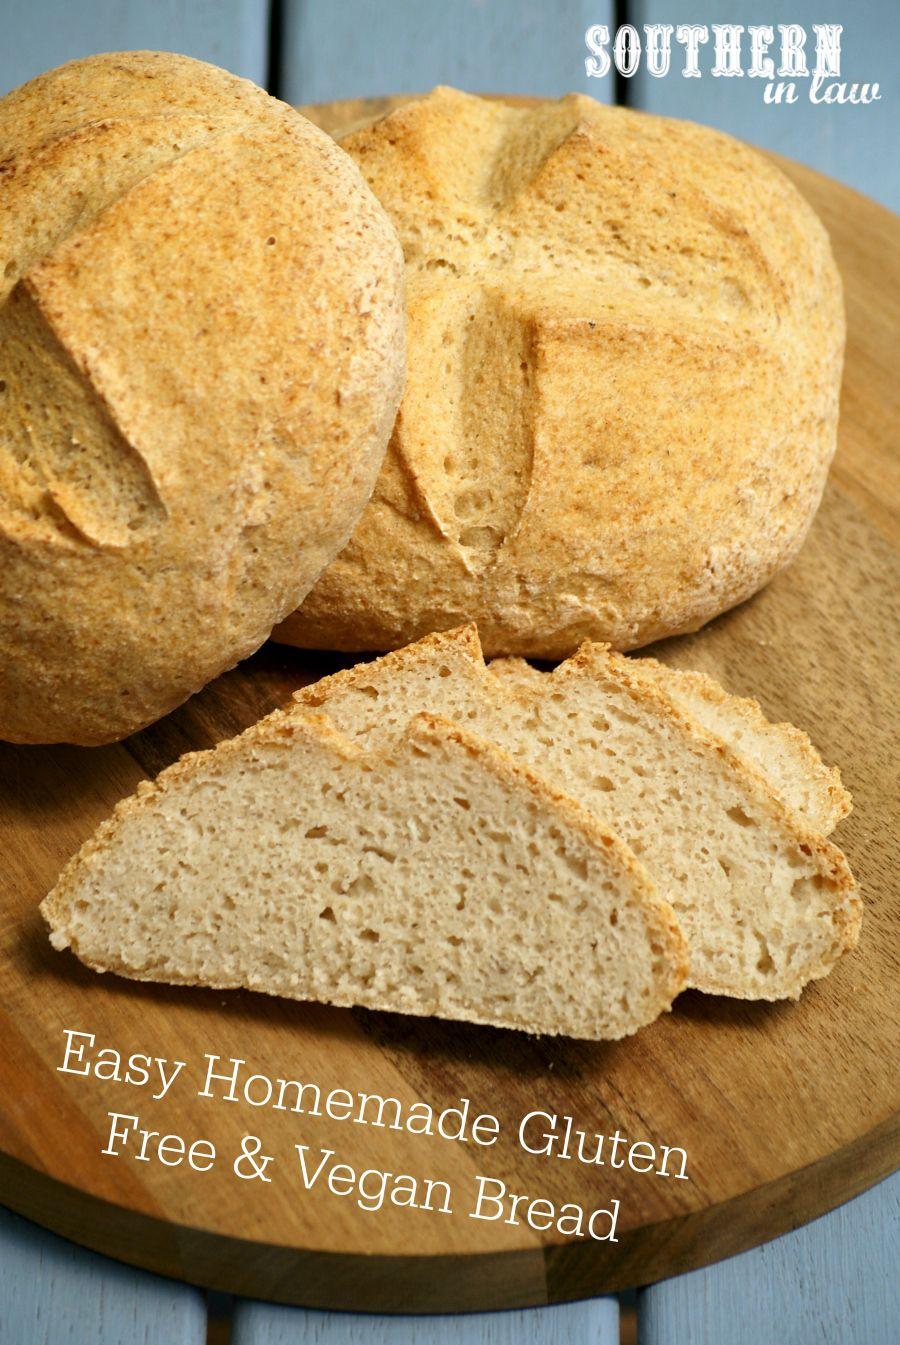 Recipe Easy Homemade Gluten Free and Vegan Bread (Crusty